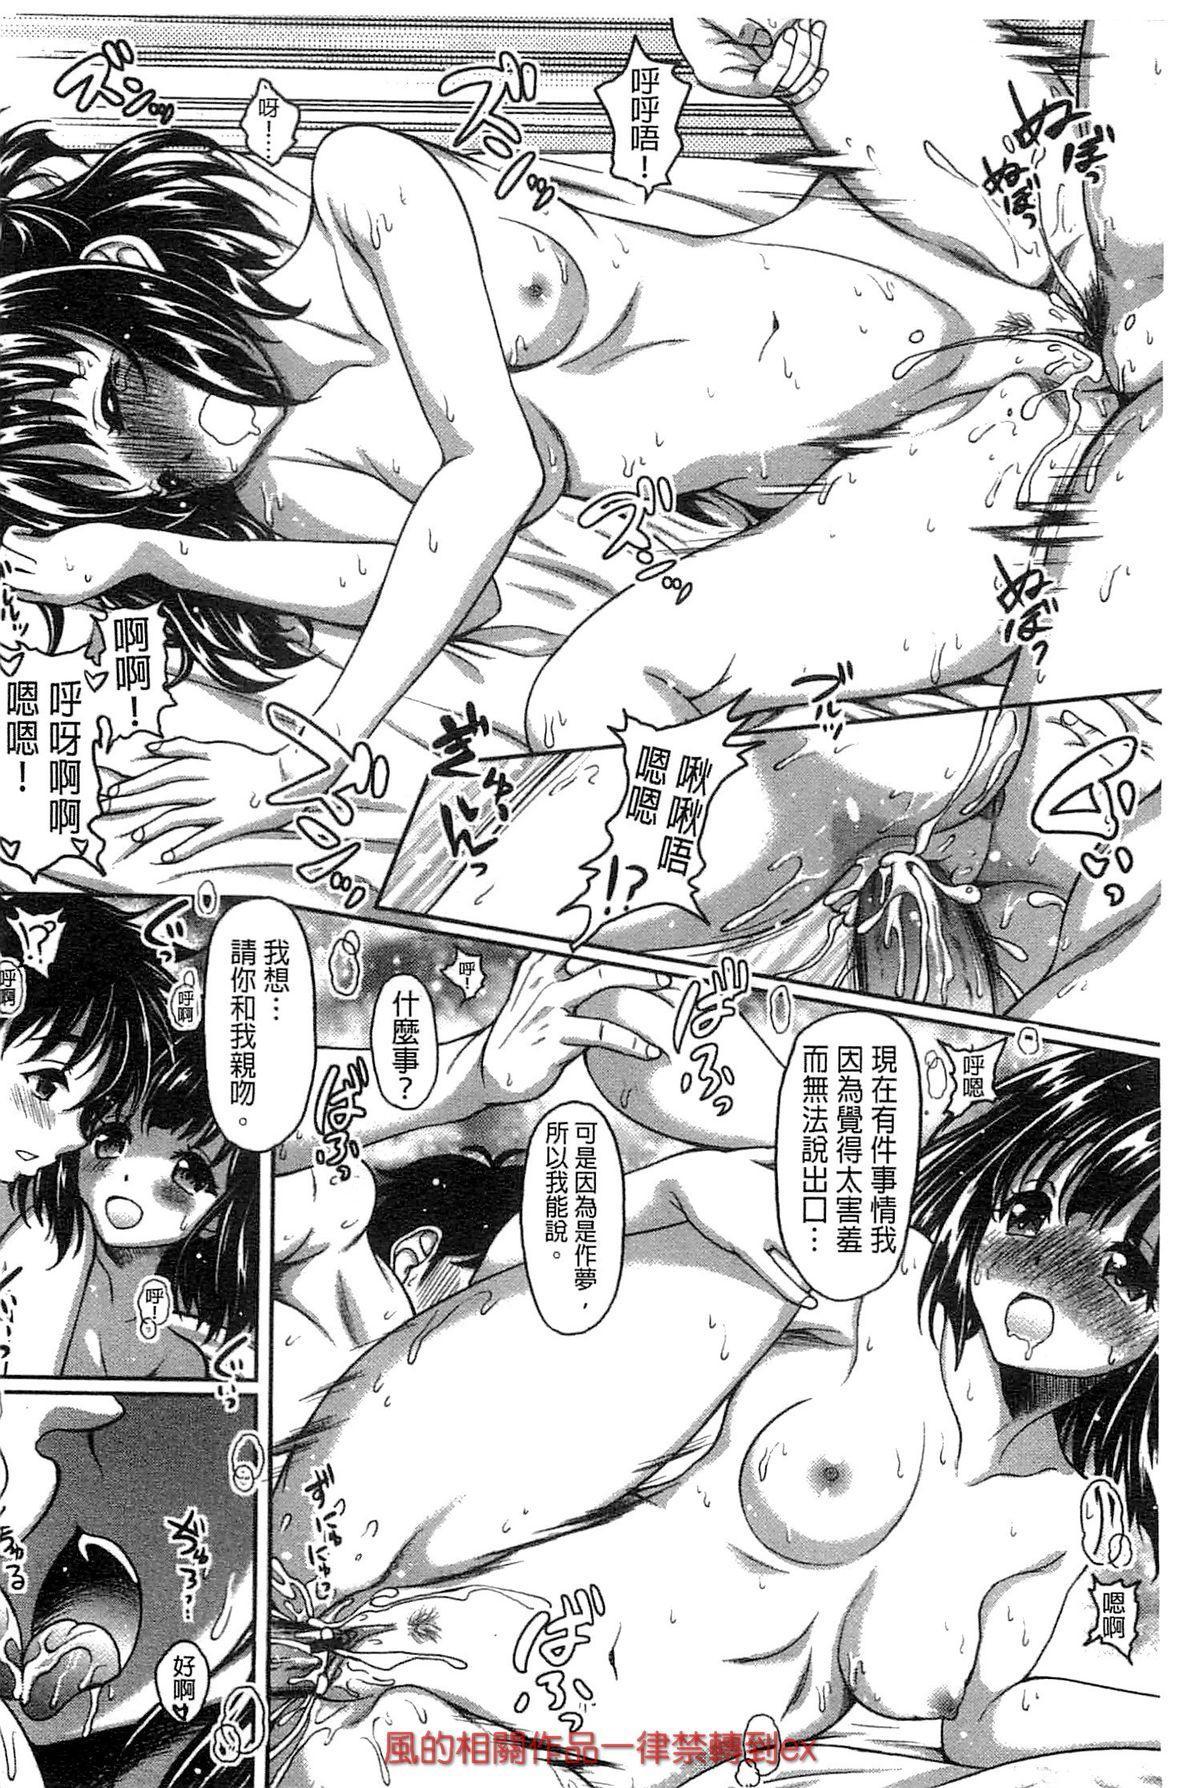 Hajimete nan da kara 94